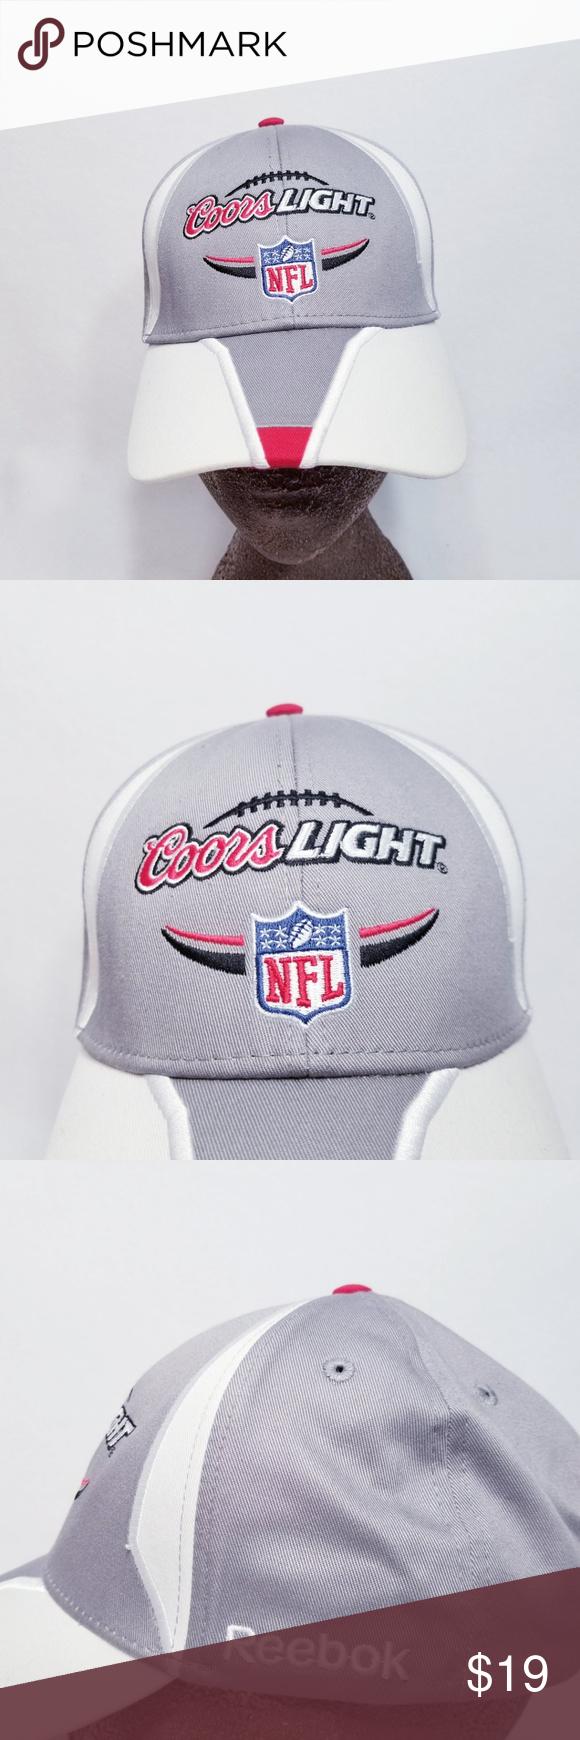 Reebok Nfl Coors Light Baseball Hat Cap Osfm Reebok Nfl Accessories Baseball Hats